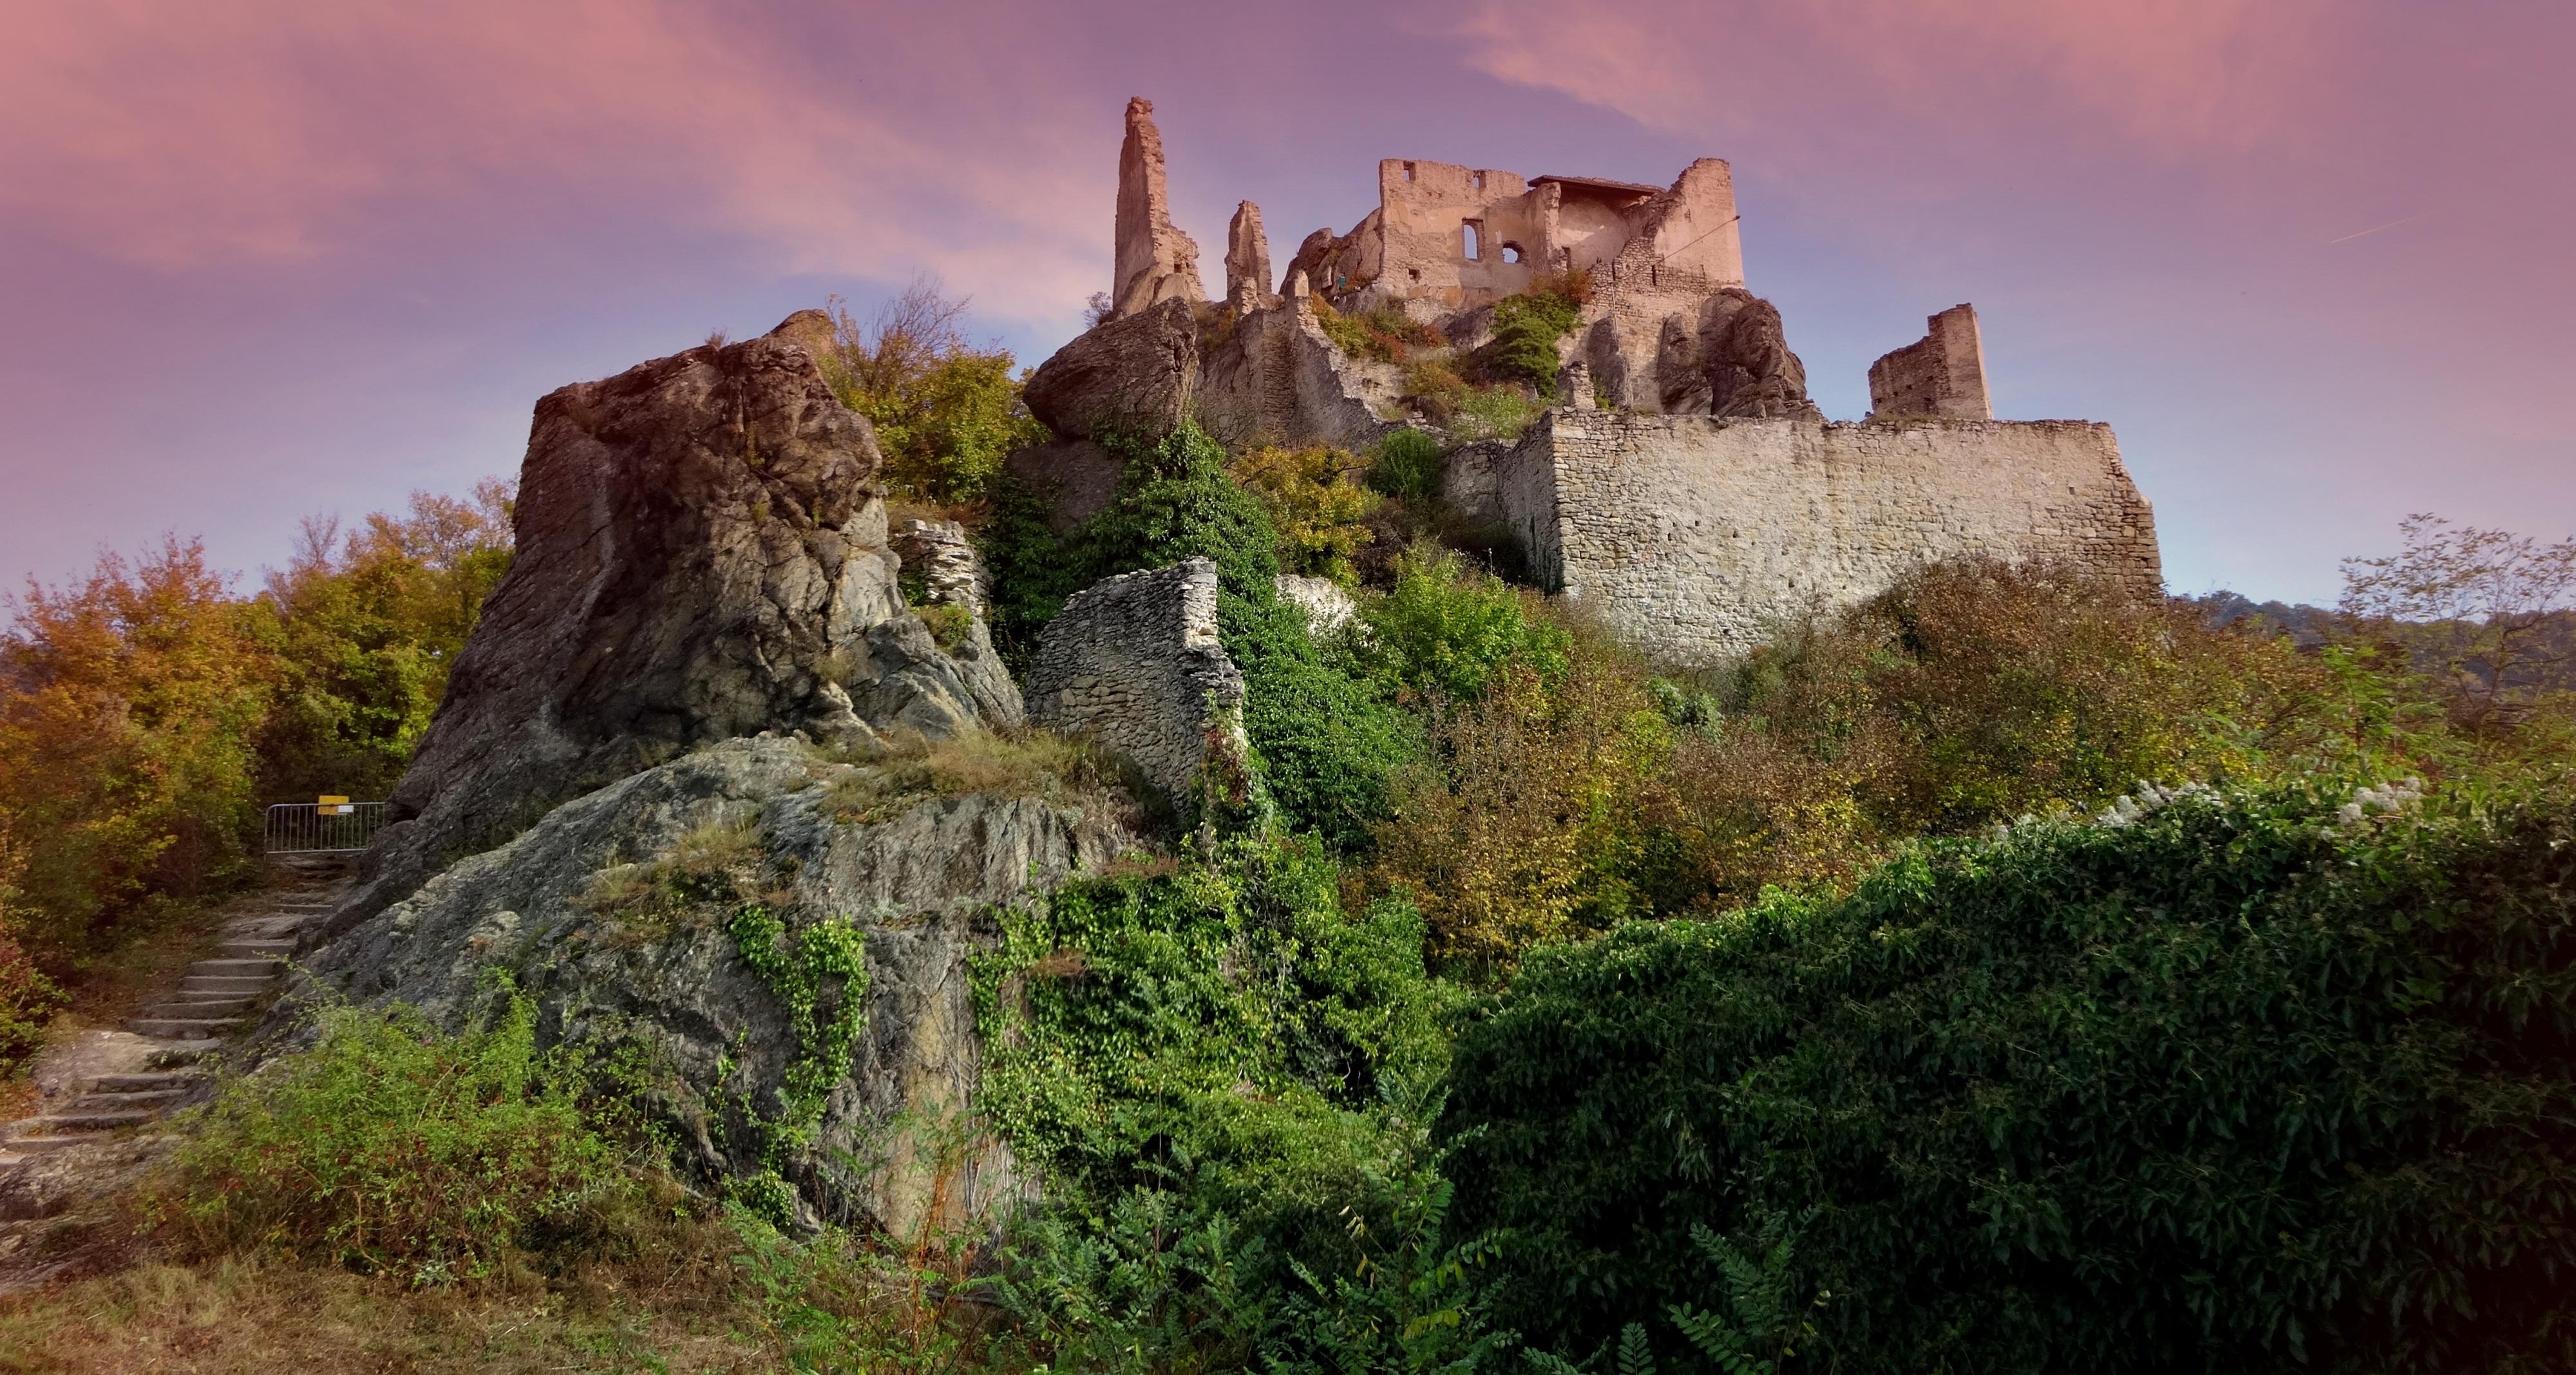 Black Dog Wallpaper Free Stock Photo Of Austria Castle Fantasy